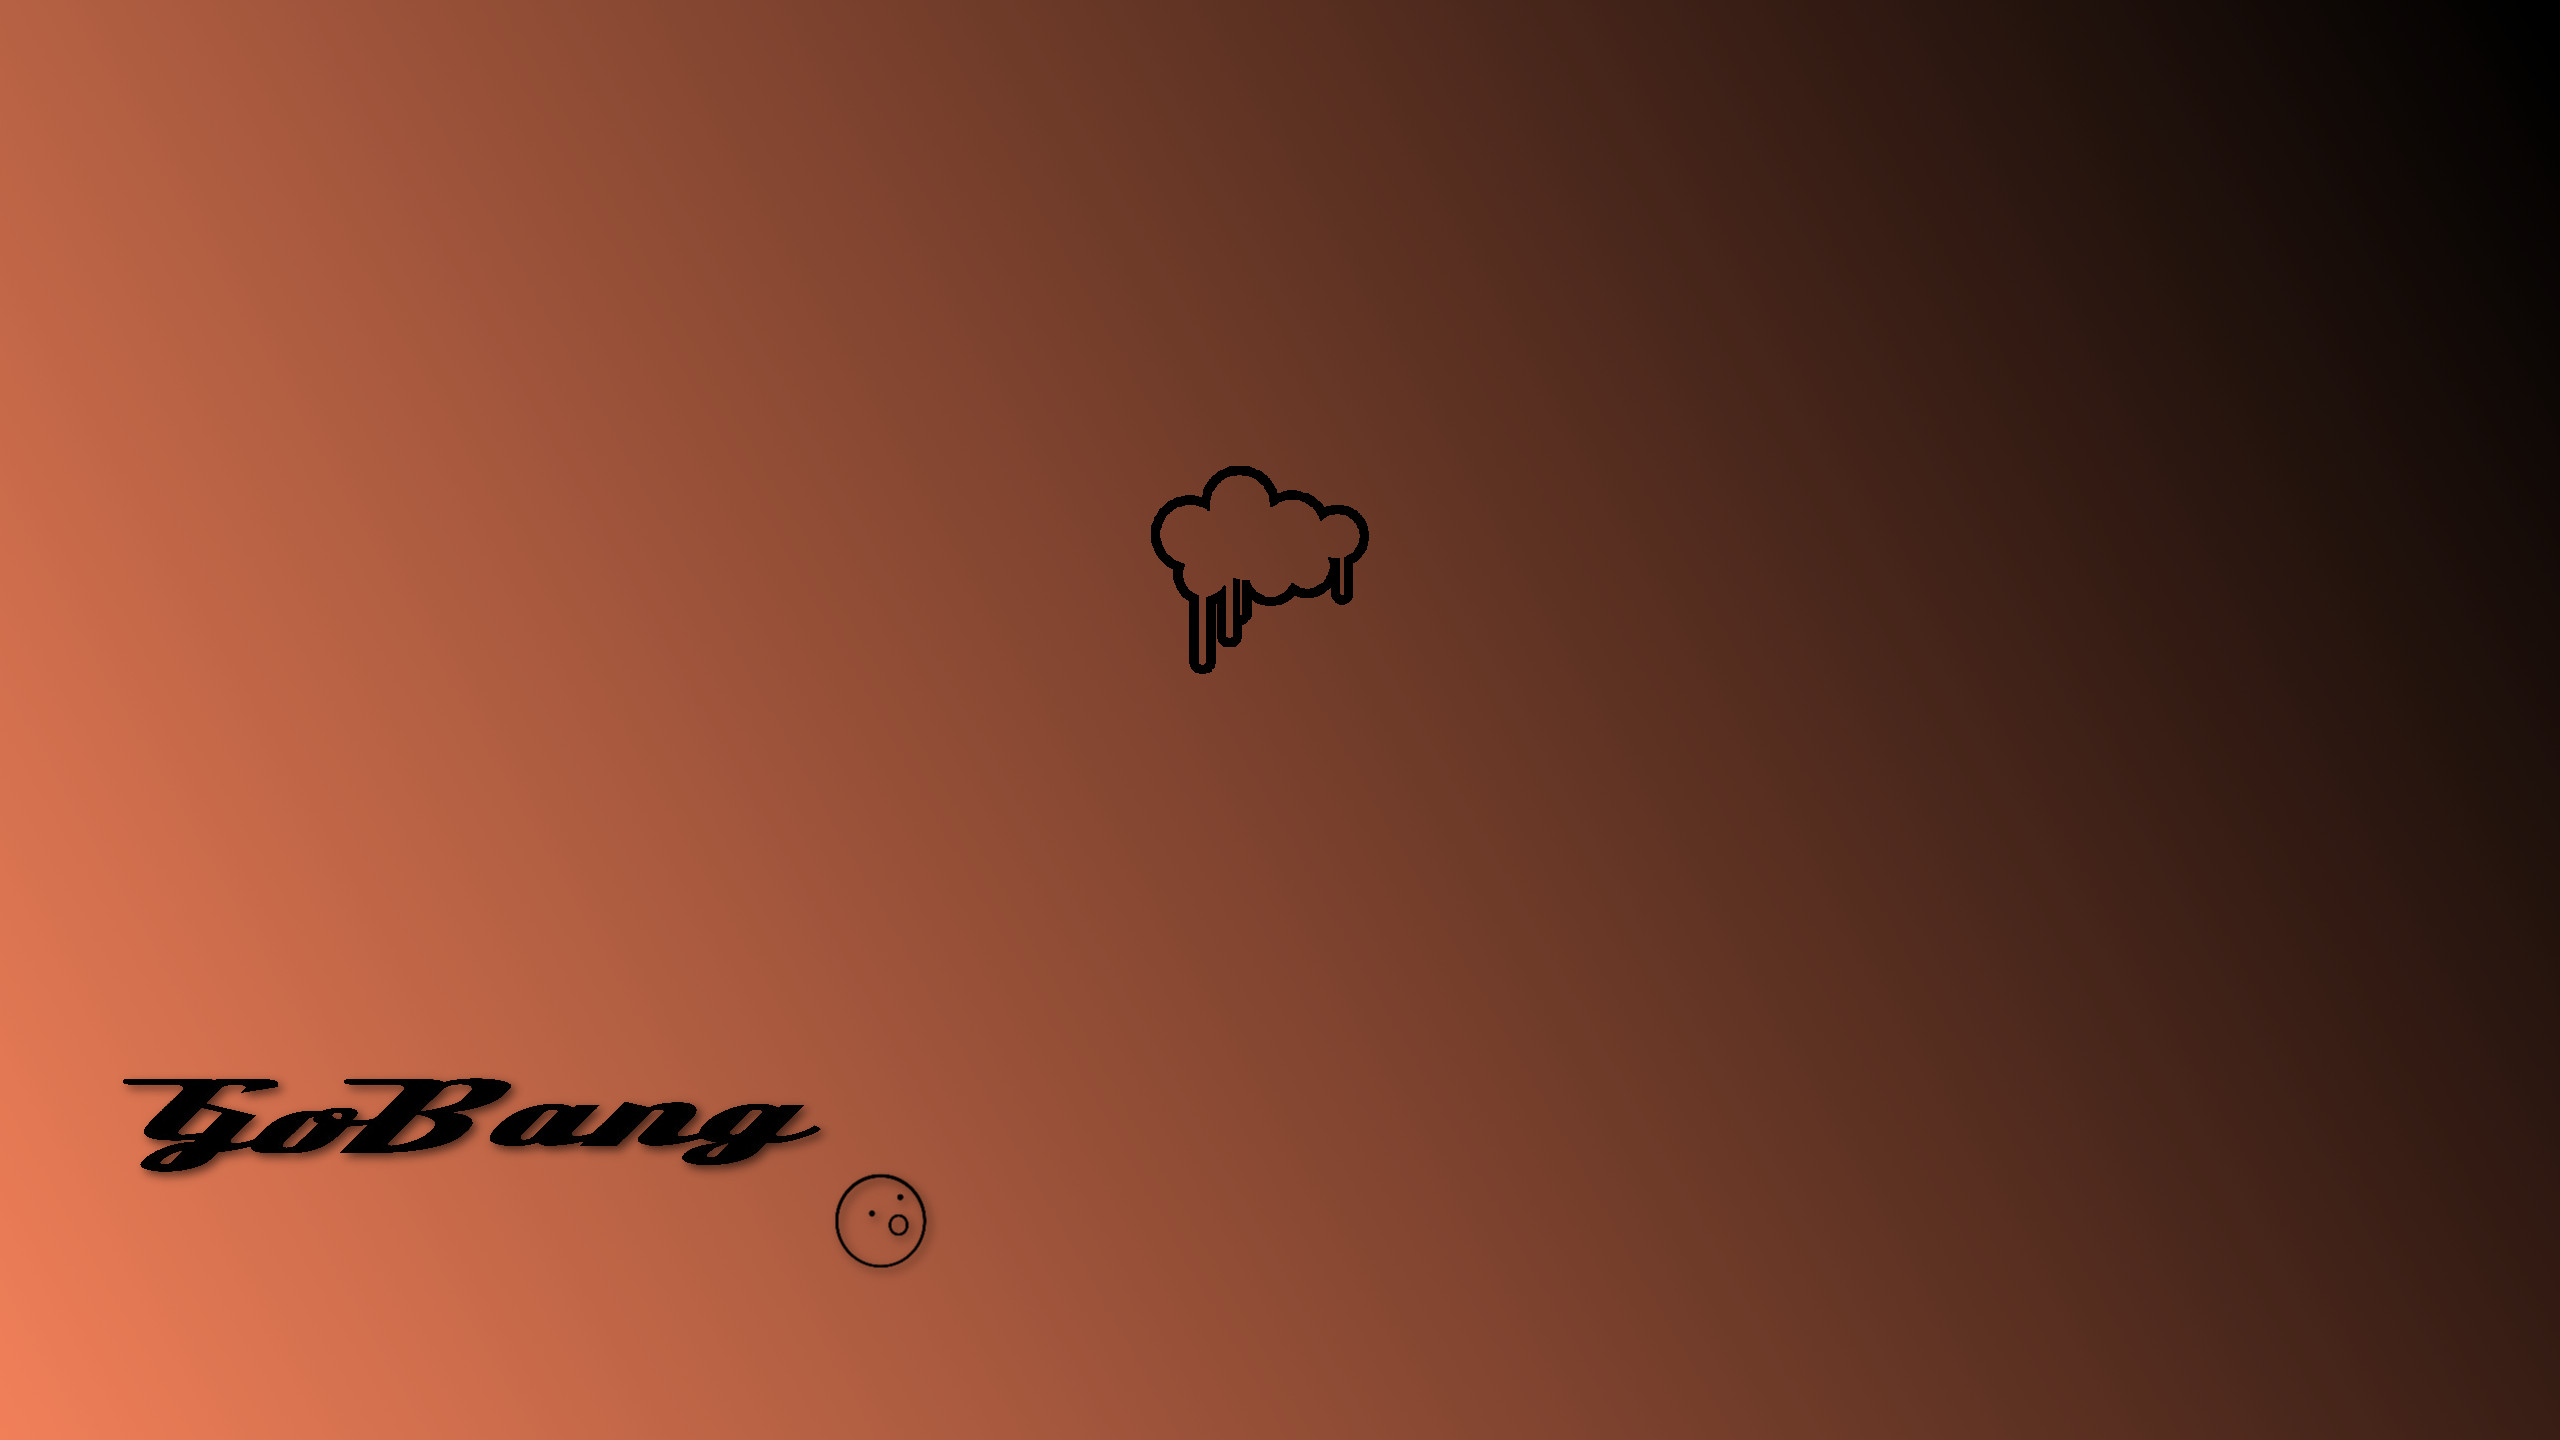 Cloud by portaro